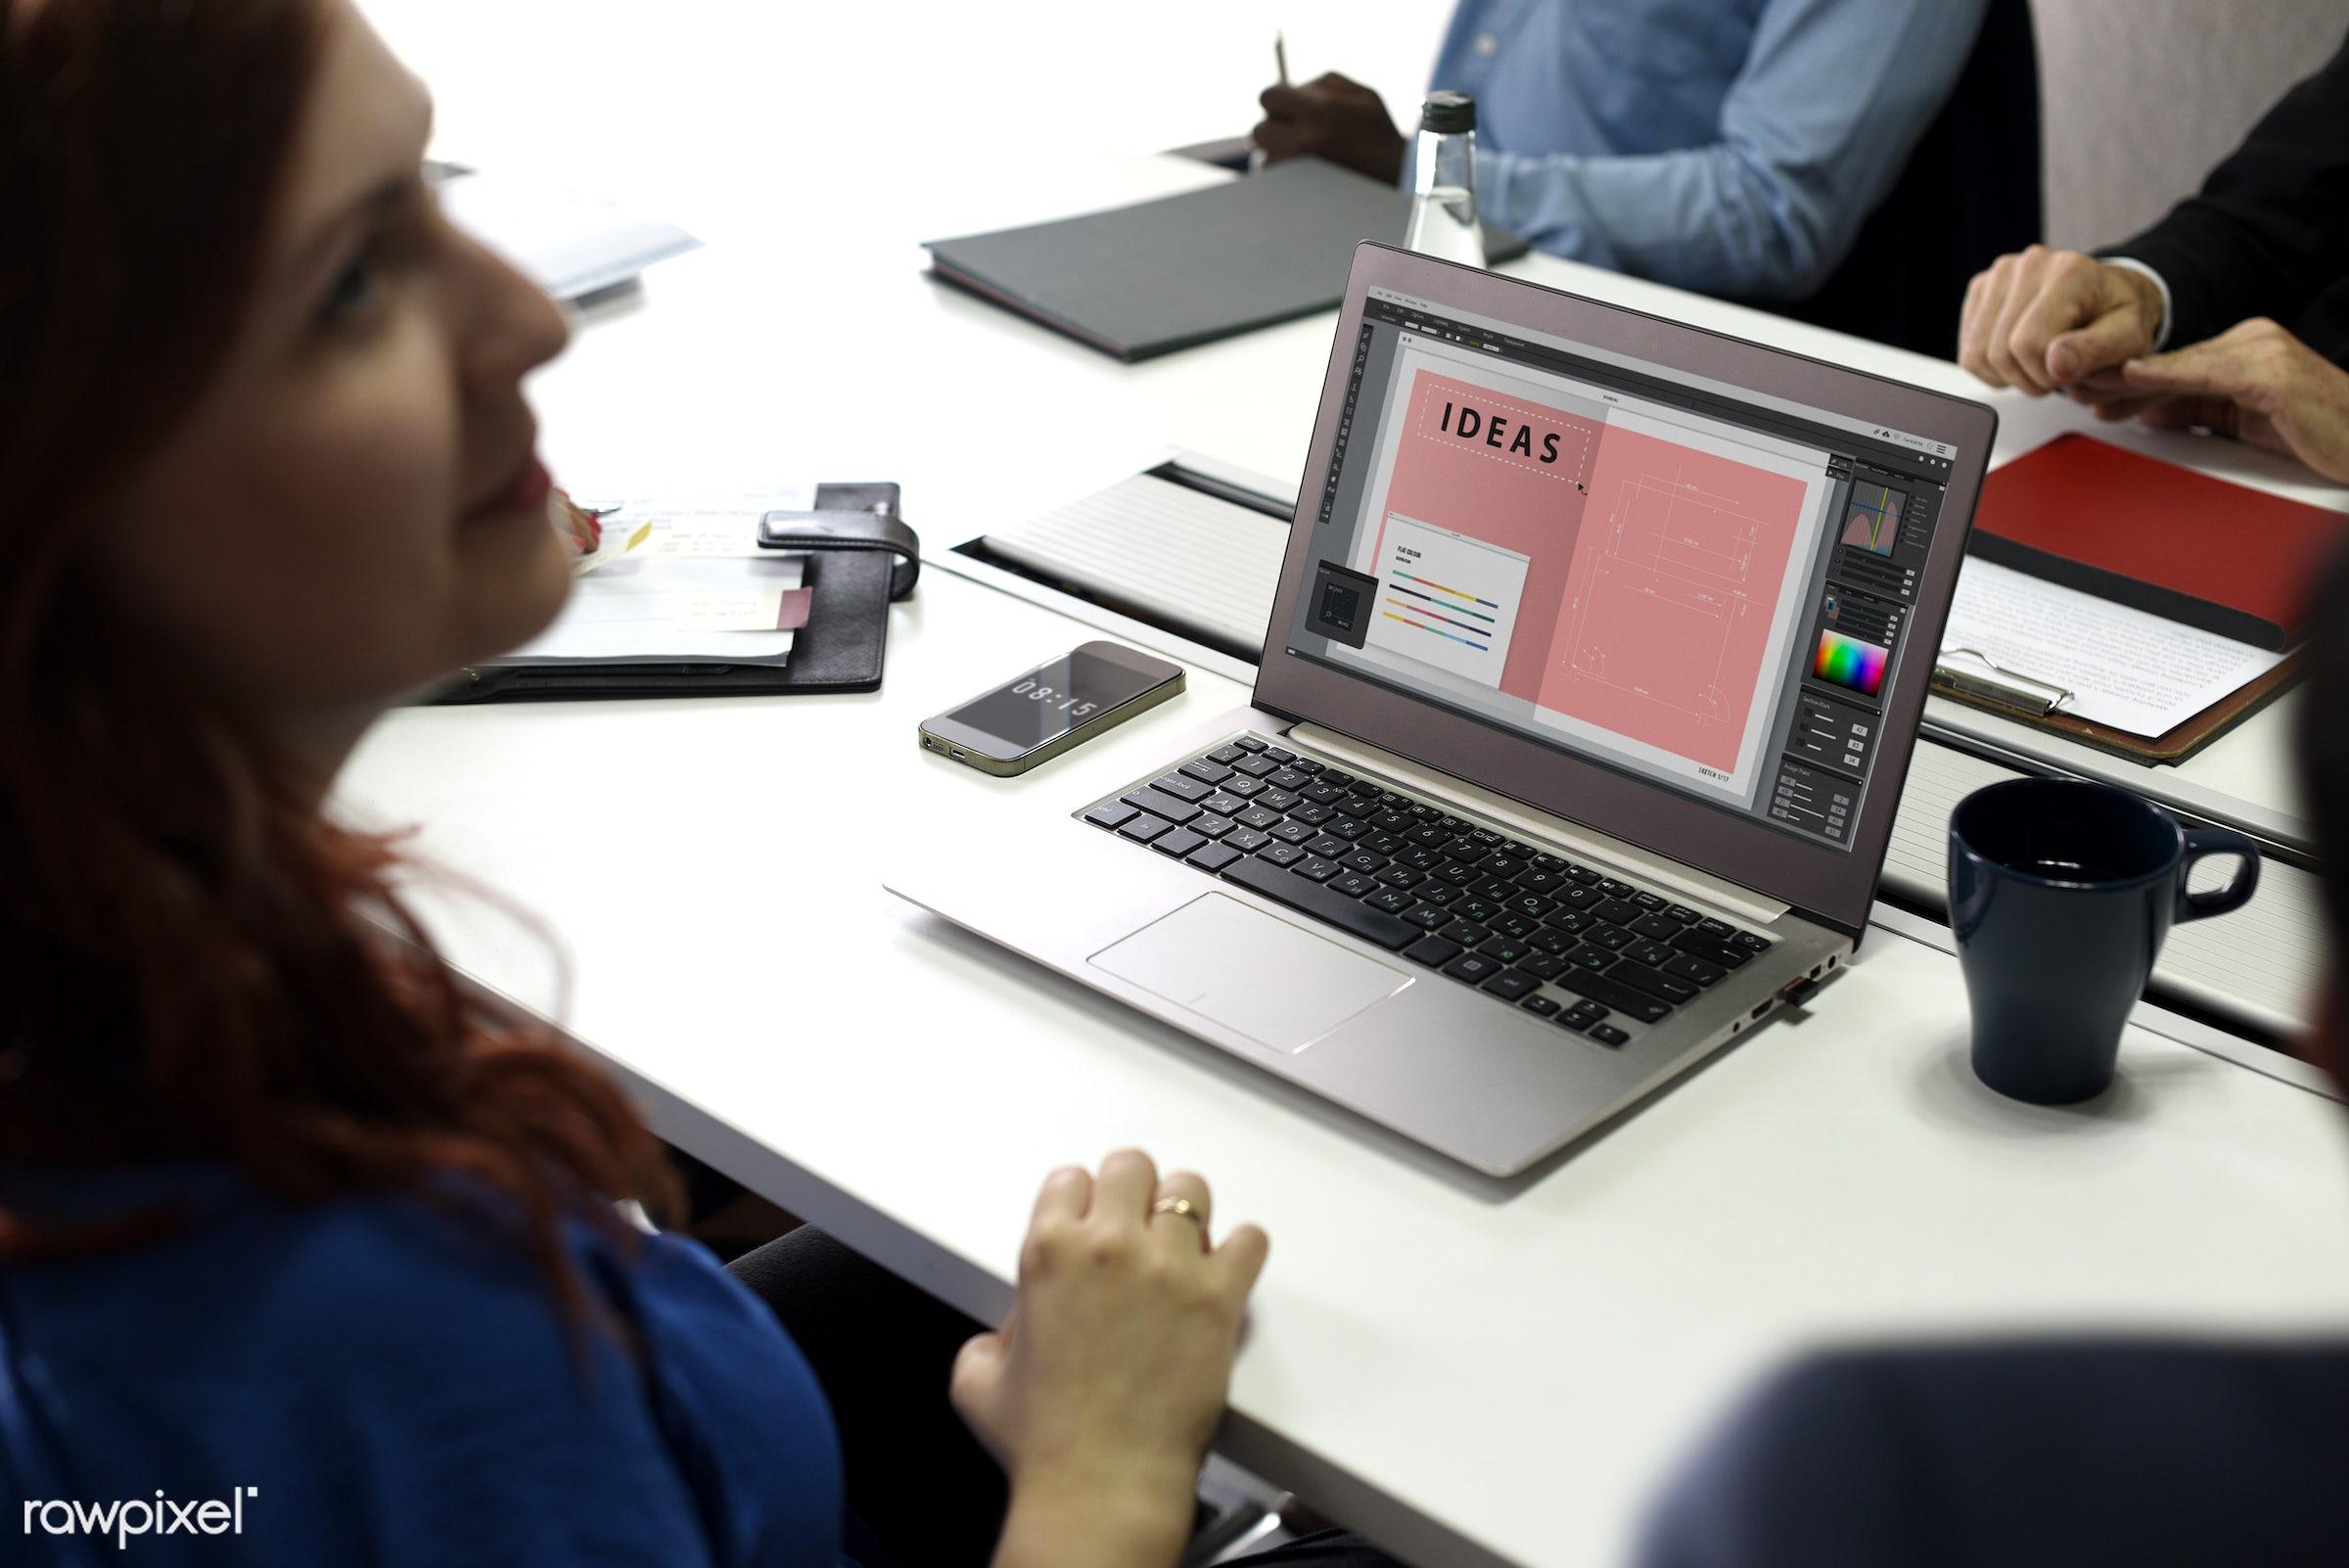 People using computer laptop - brainstorm, casual, cc0, colleagues, communication, creative, creative common 0, creative...